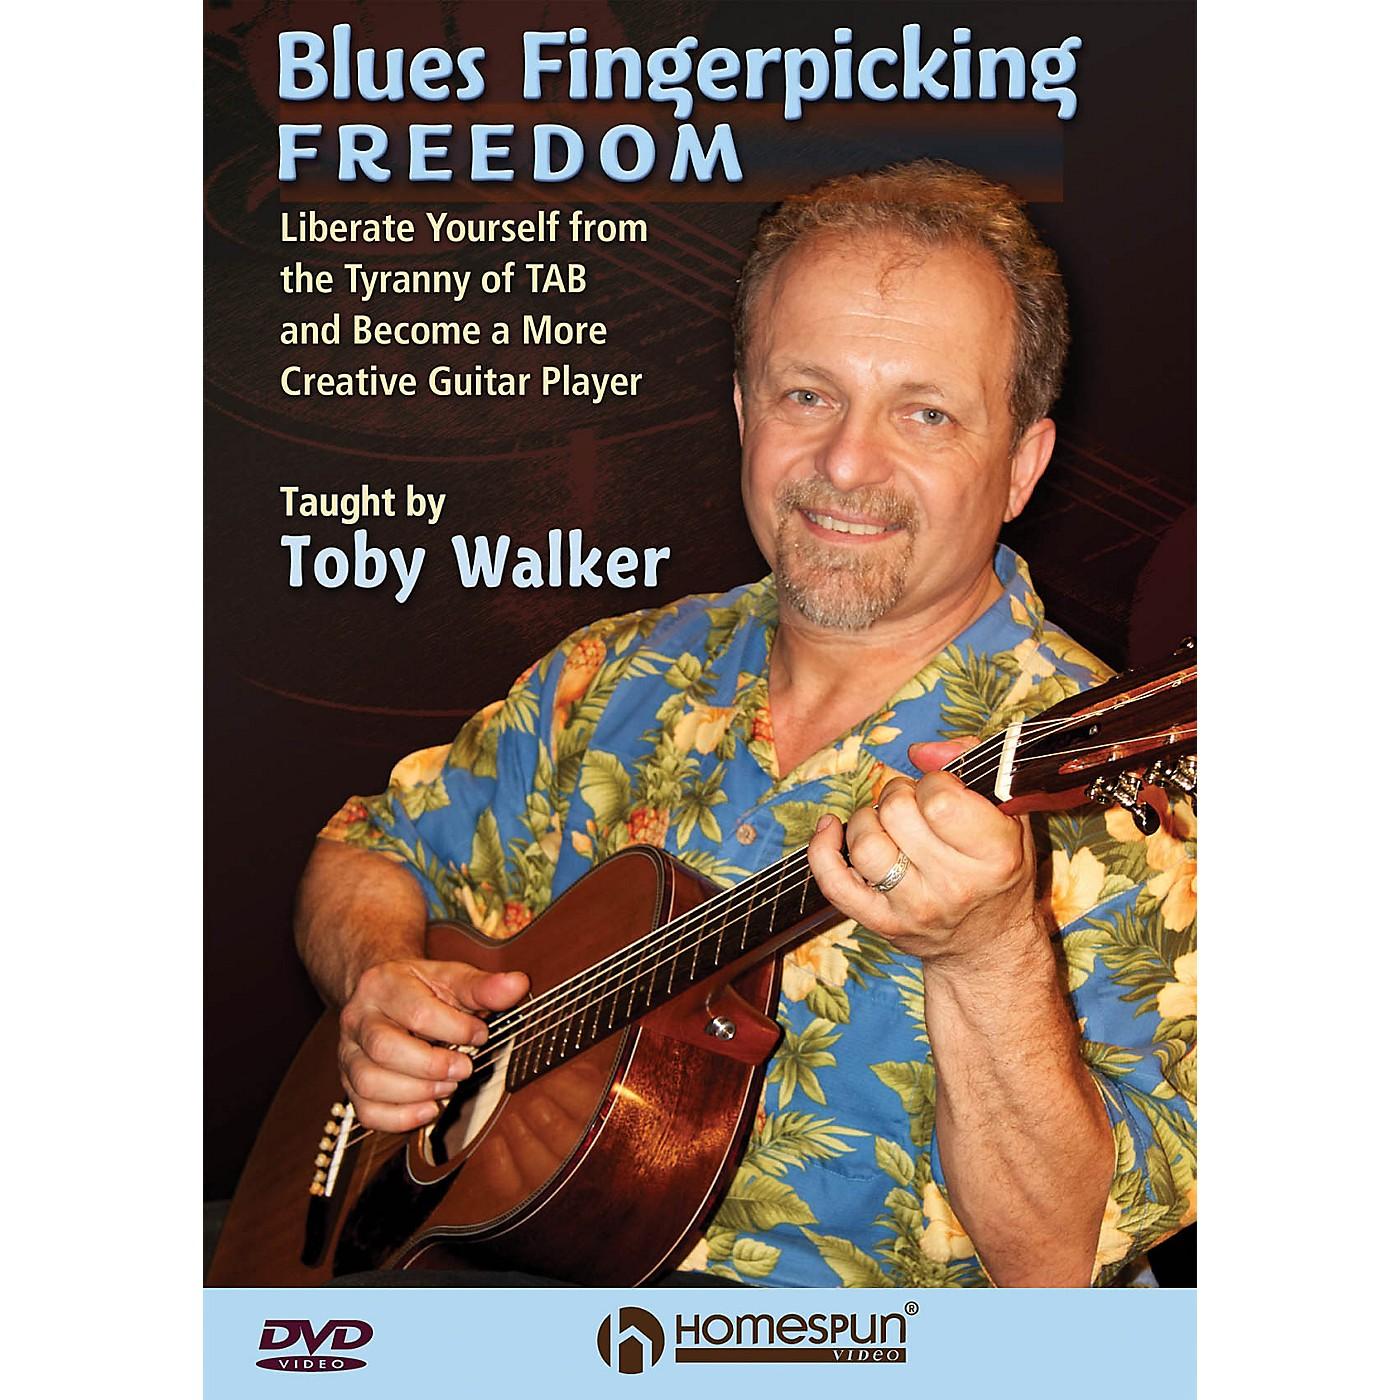 Homespun Blues Fingerpicking Freedom Homespun Tapes Series DVD Written by Toby Walker thumbnail